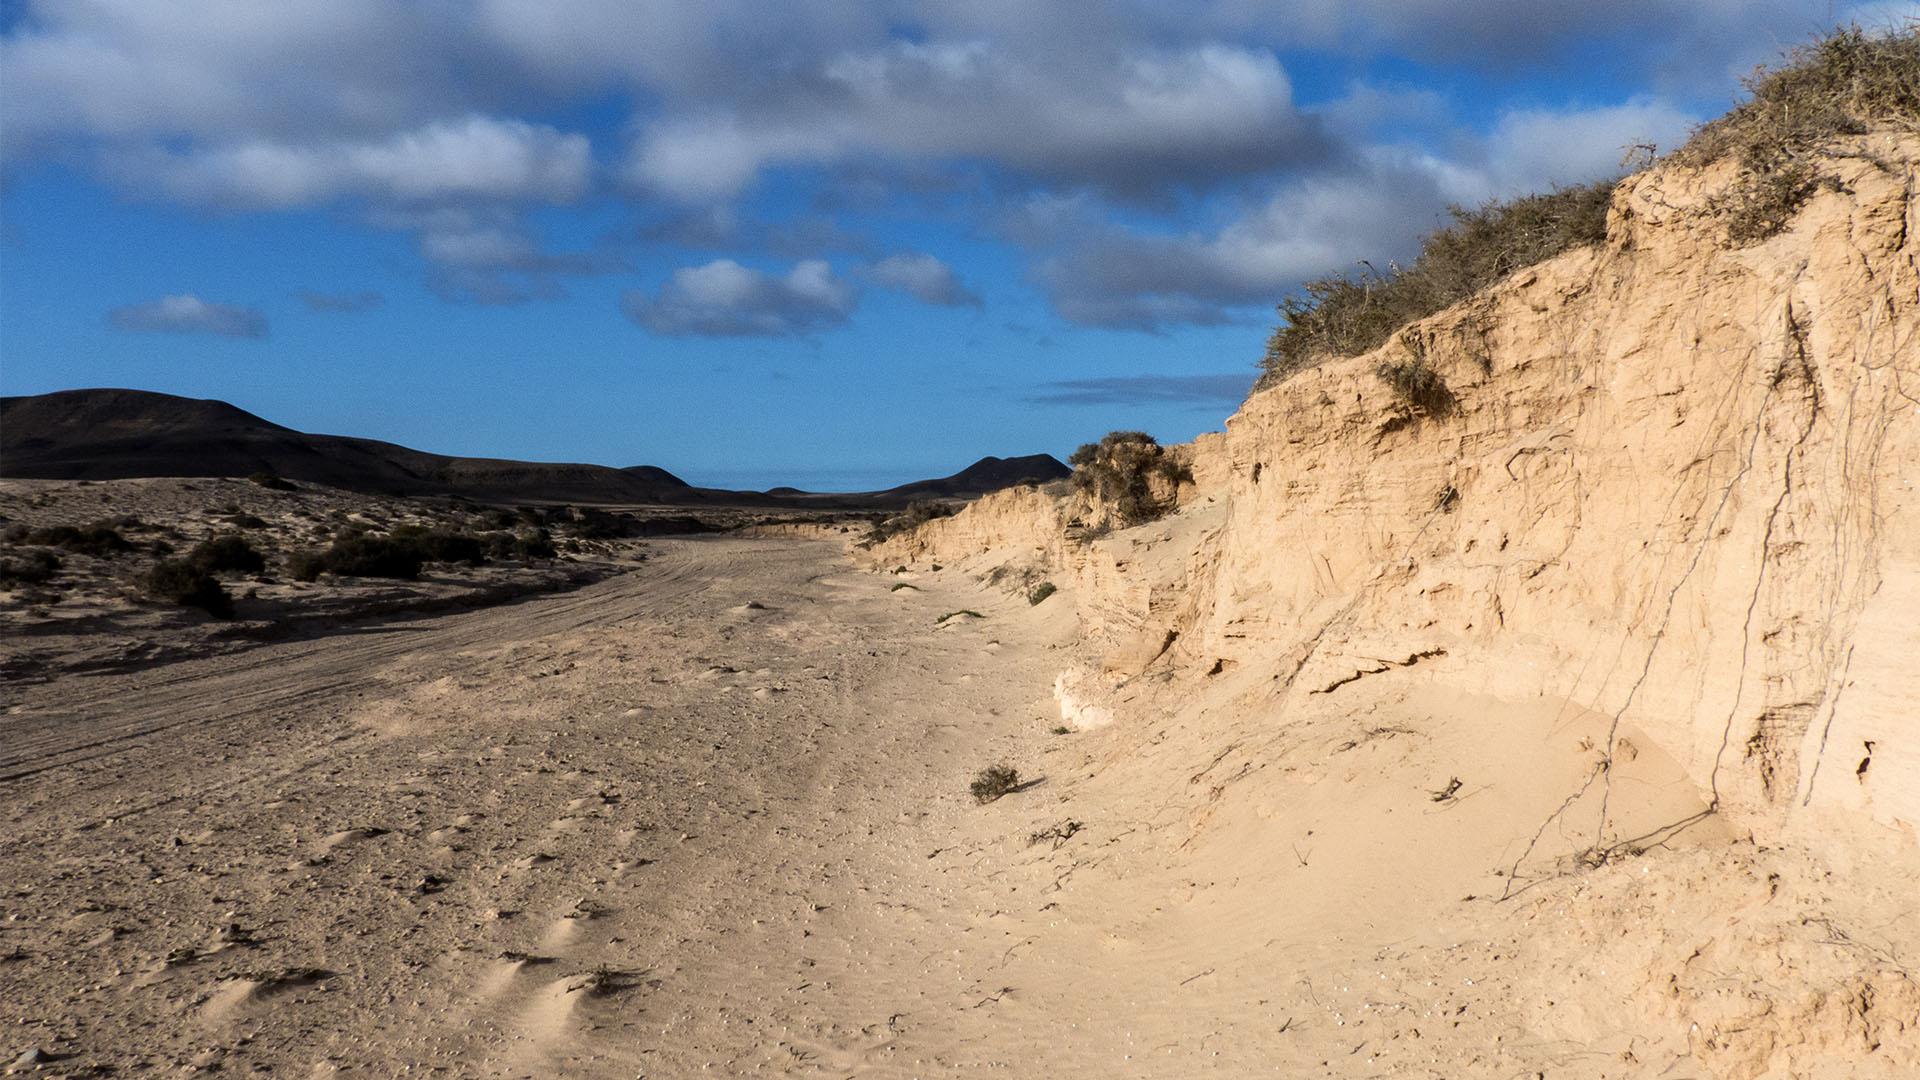 Sehenswürdigkeiten Fuerteventuras: Lajares – Canada de Melián